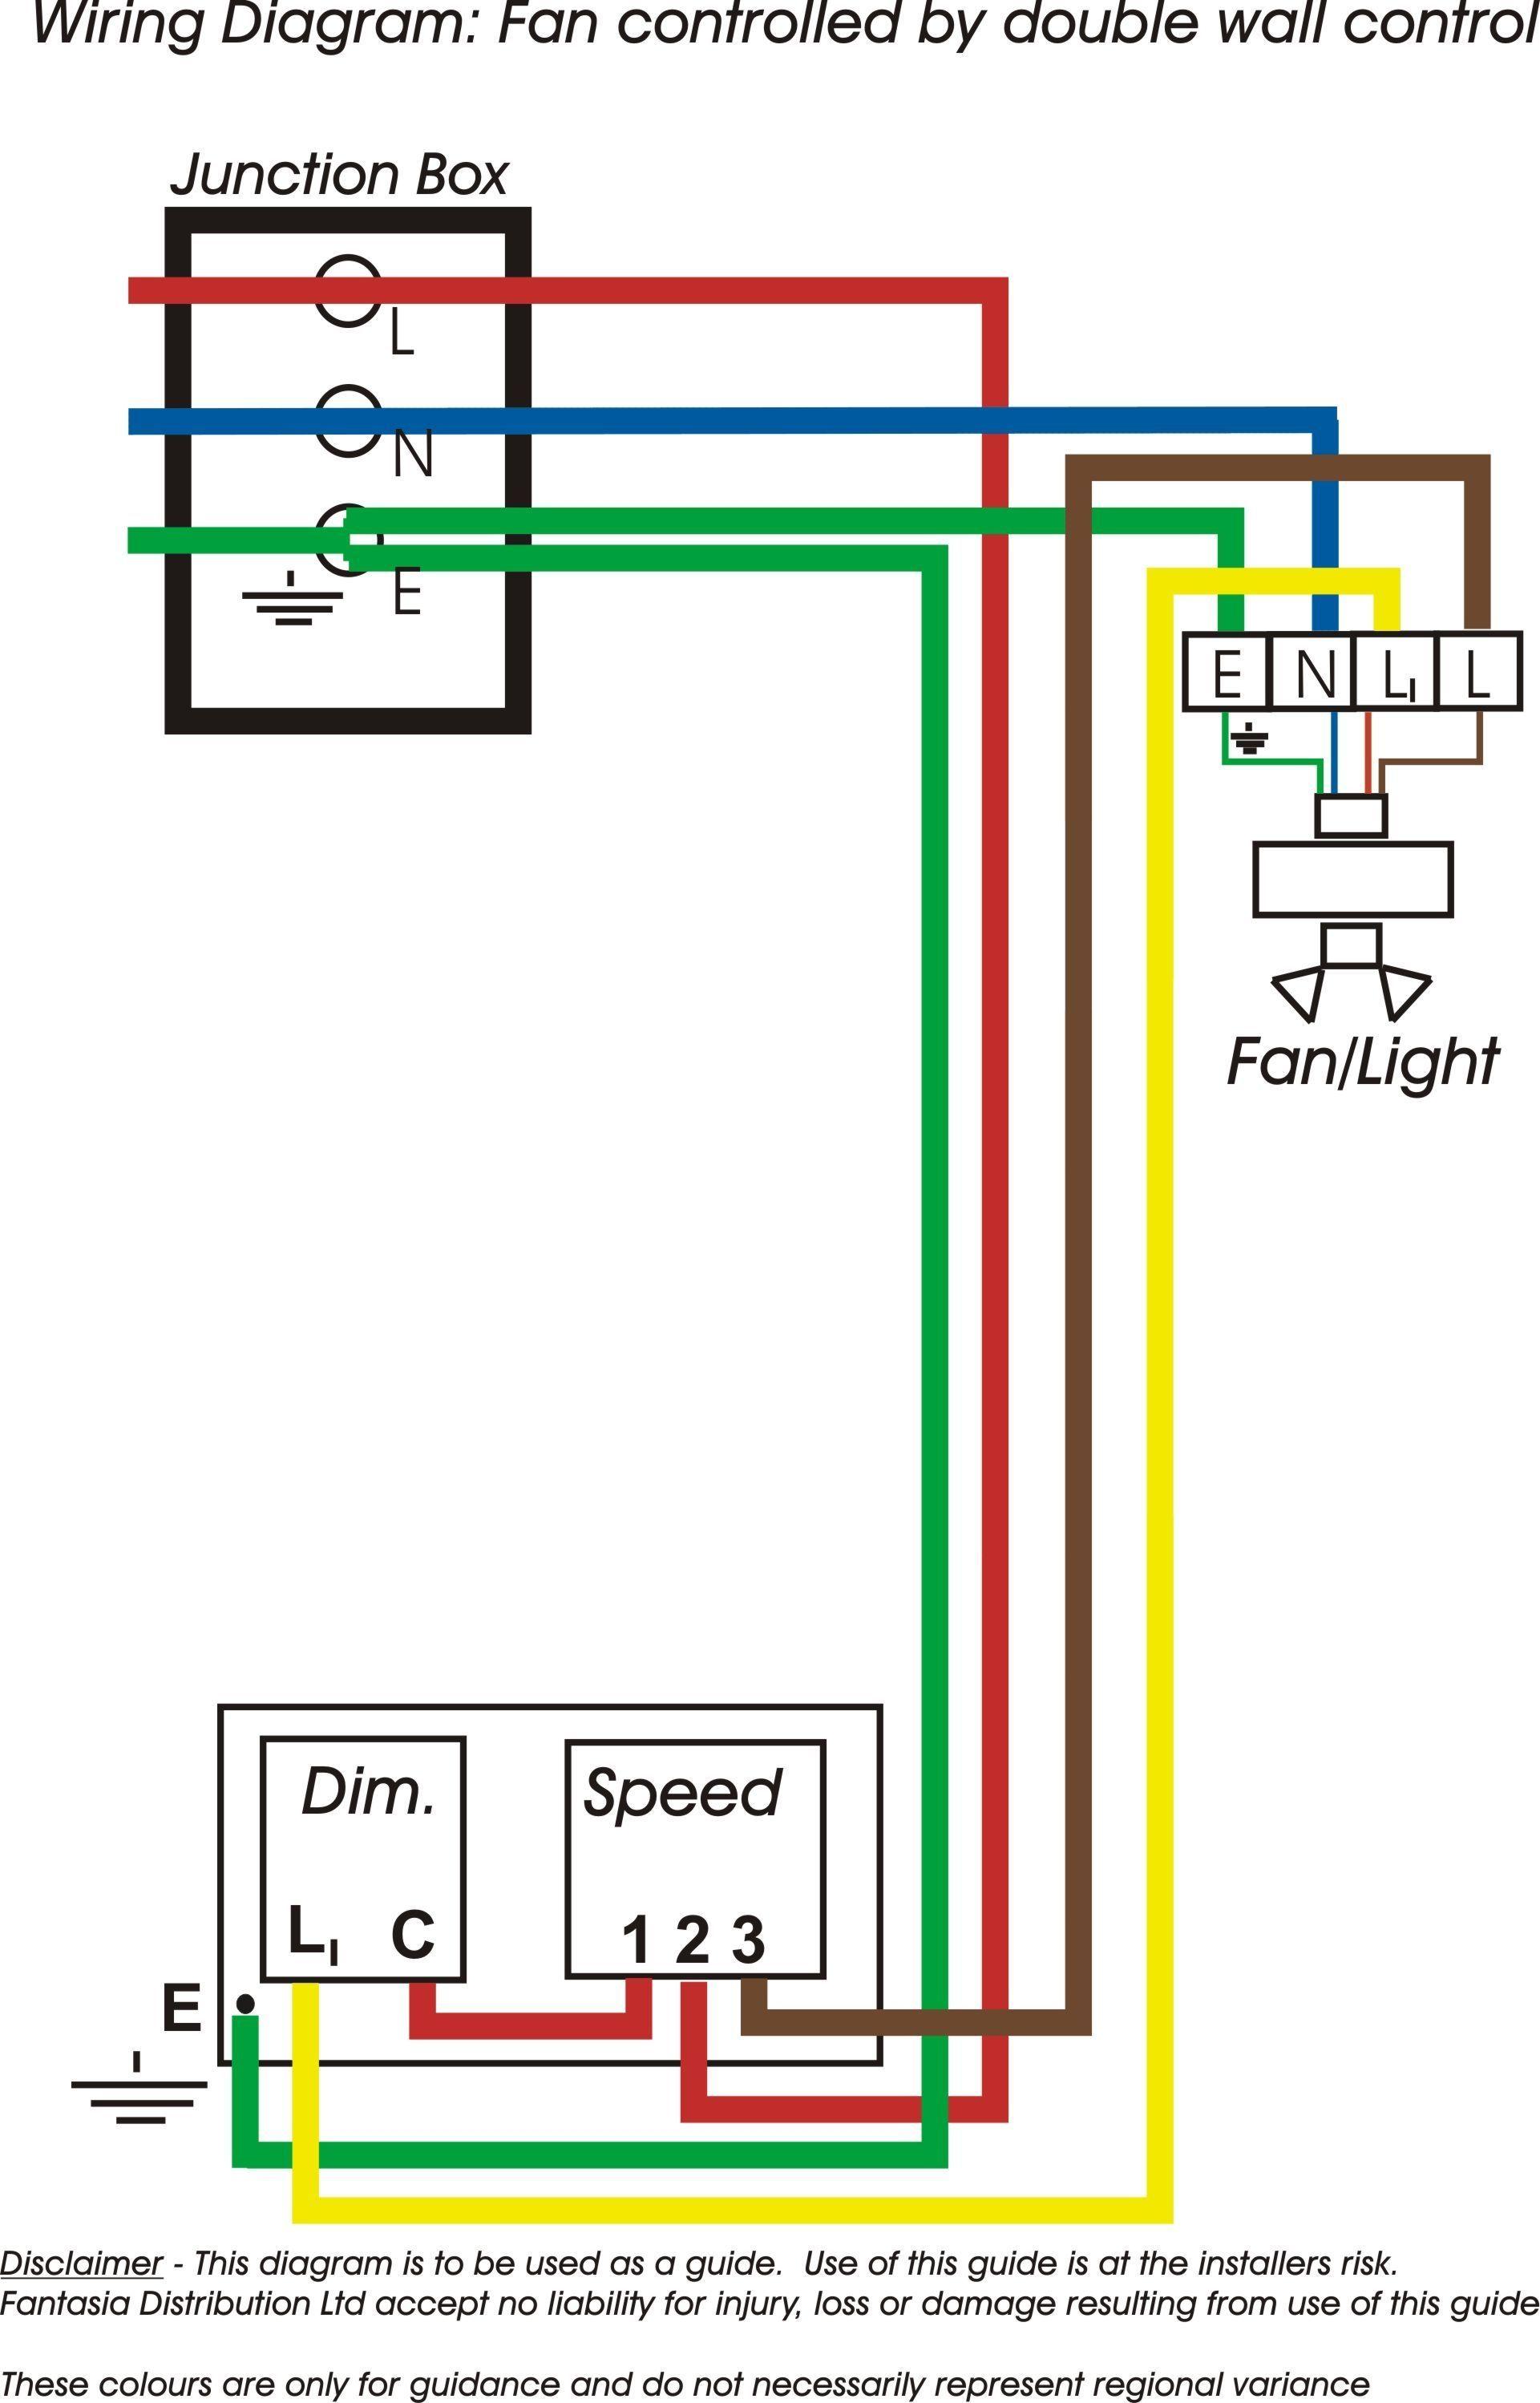 Wiring Diagram For Ceiling Fan With Light Ceiling fan